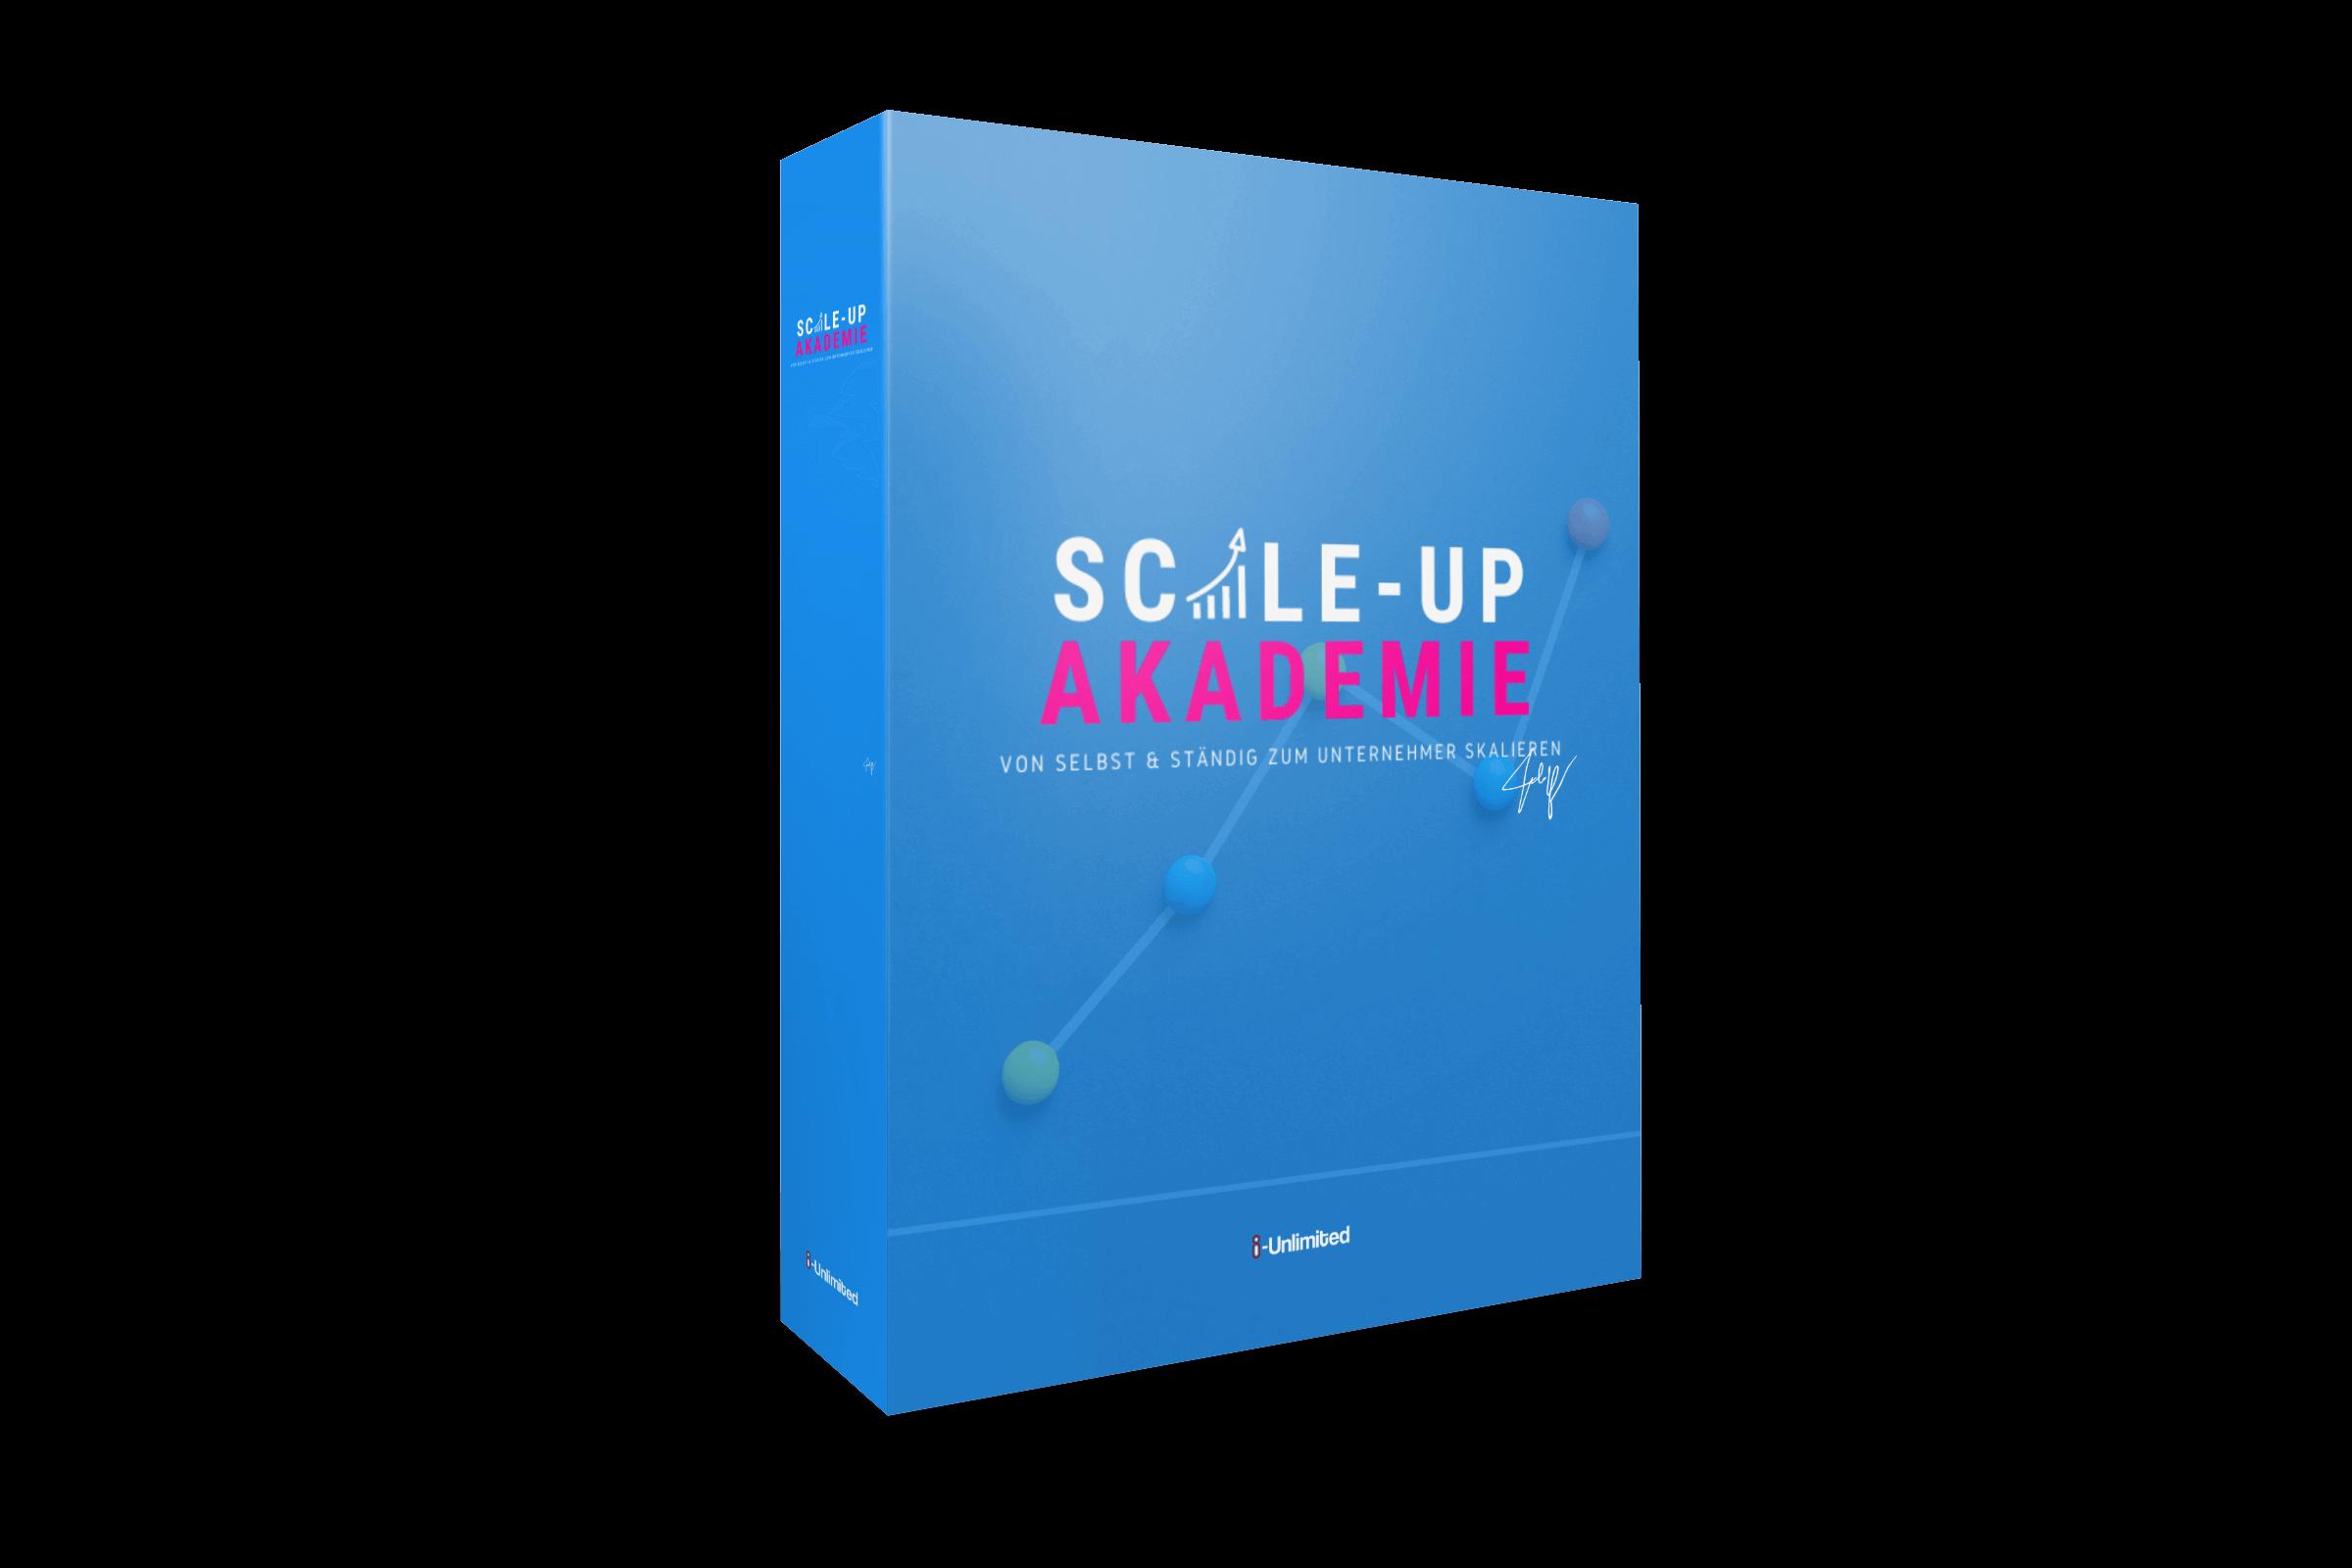 scale_up_akademie_box